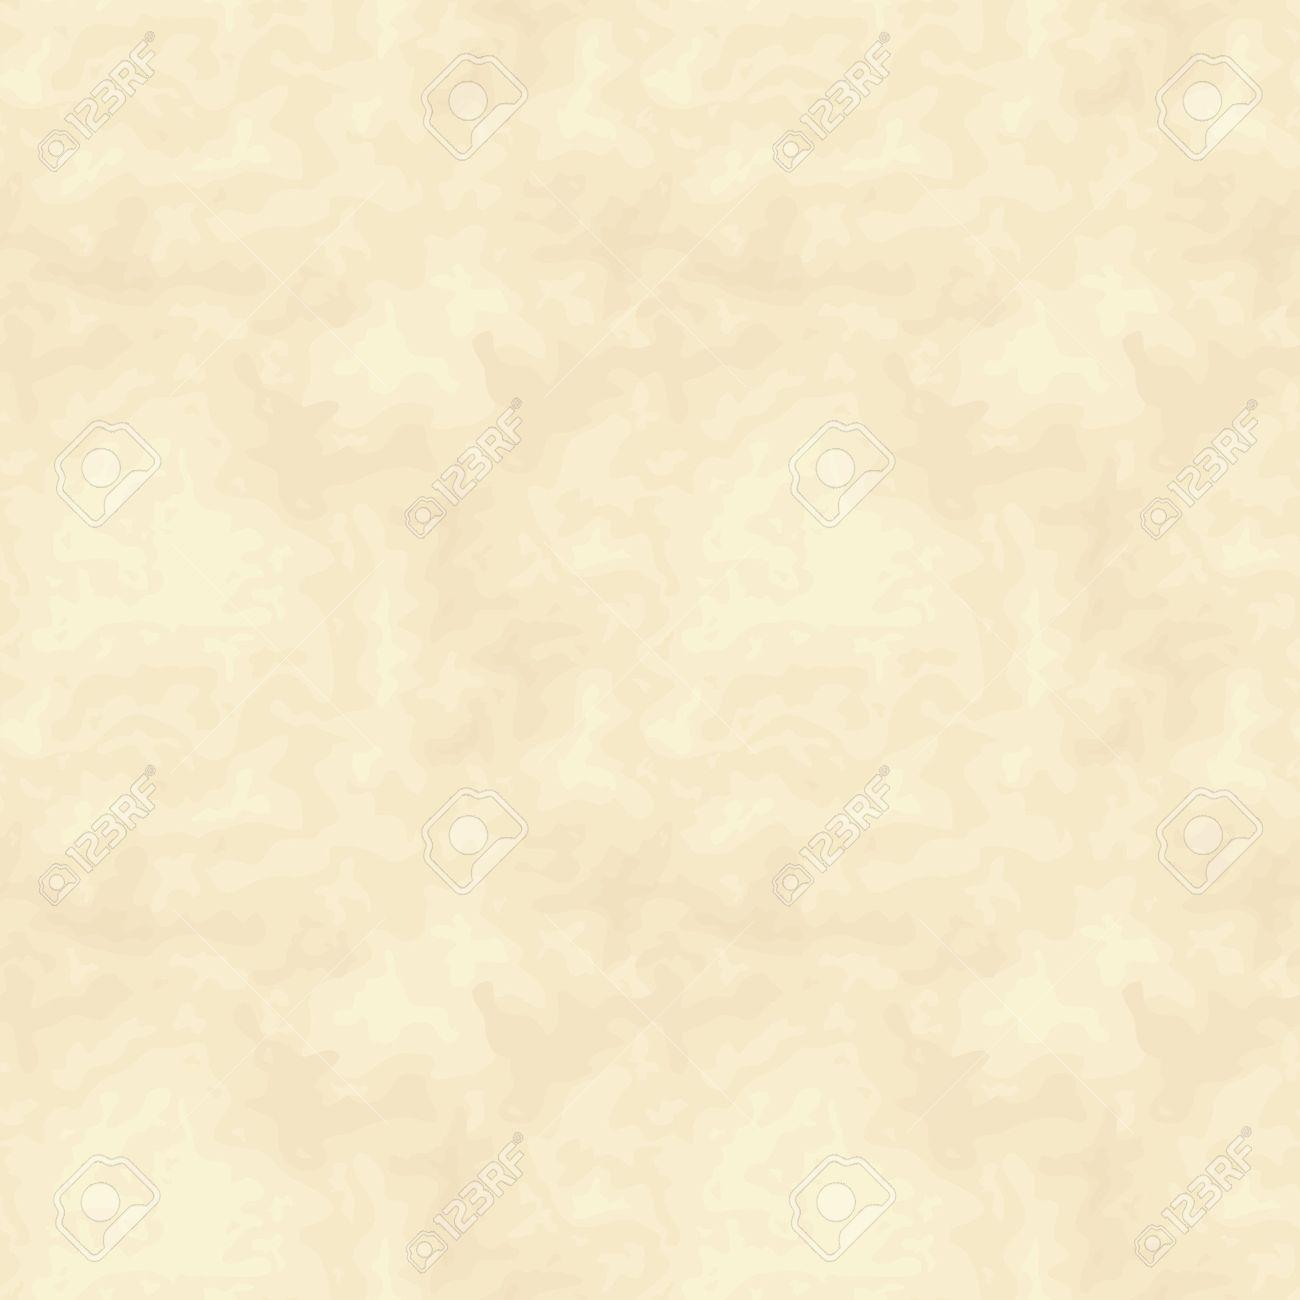 parchment paper vector seamless